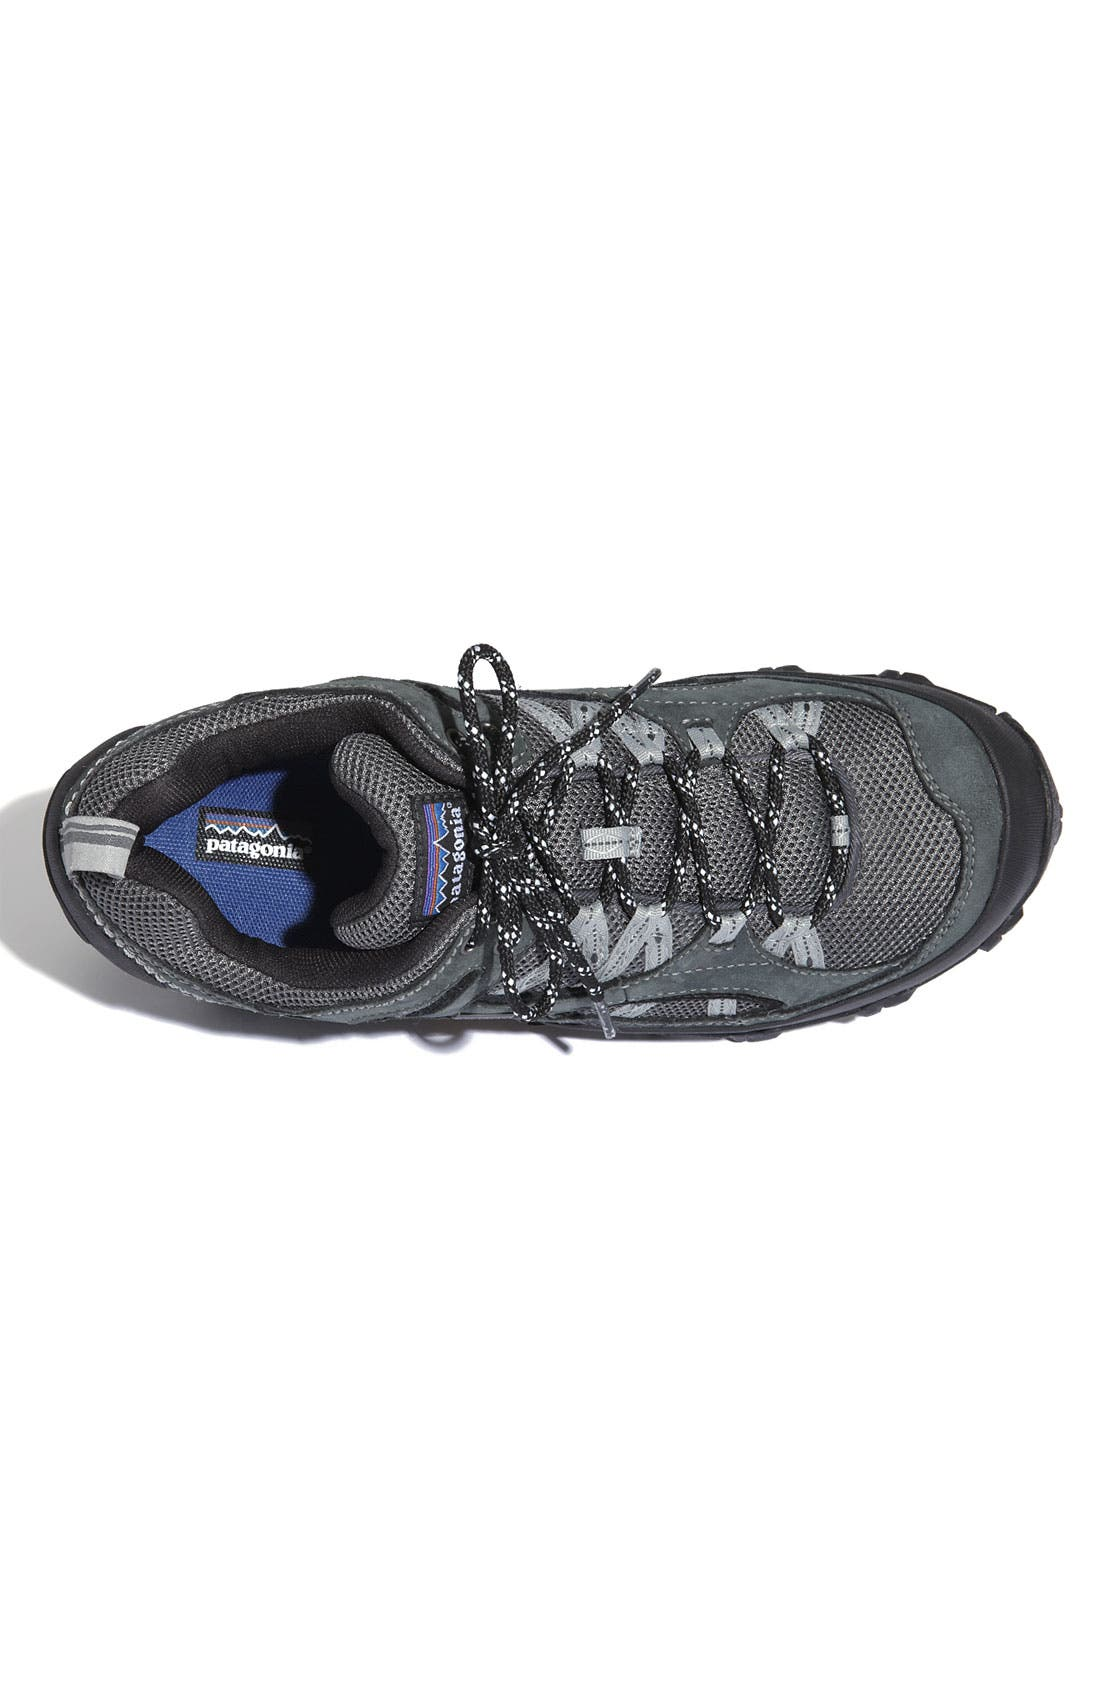 Alternate Image 3  - Patagonia 'Drifter AC GTX' Trail Shoe